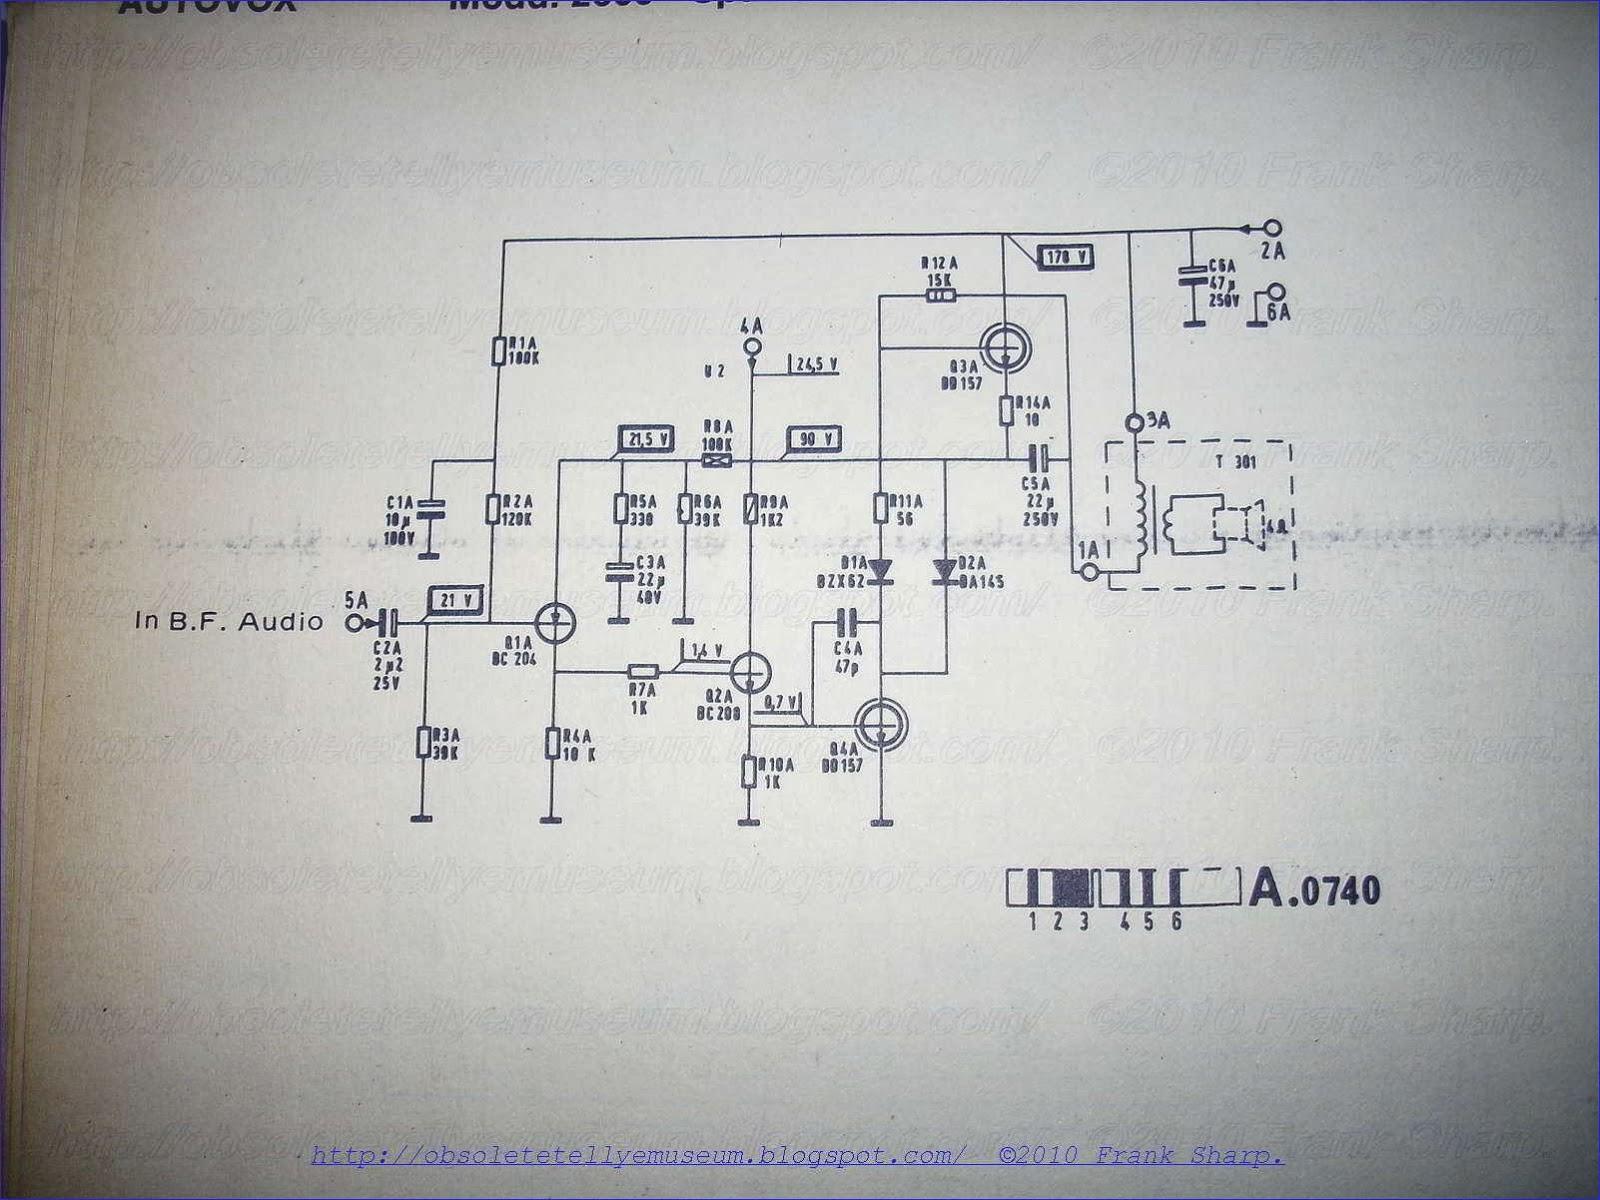 Obsolete Technology Tellye Autovox Tvc2609 Spazio 99tc Chassis Hobby Circuit Cmos Inverters Form 125khz Oscillator 121 Power Supply Constant Voltage Converter Employing Thyristor